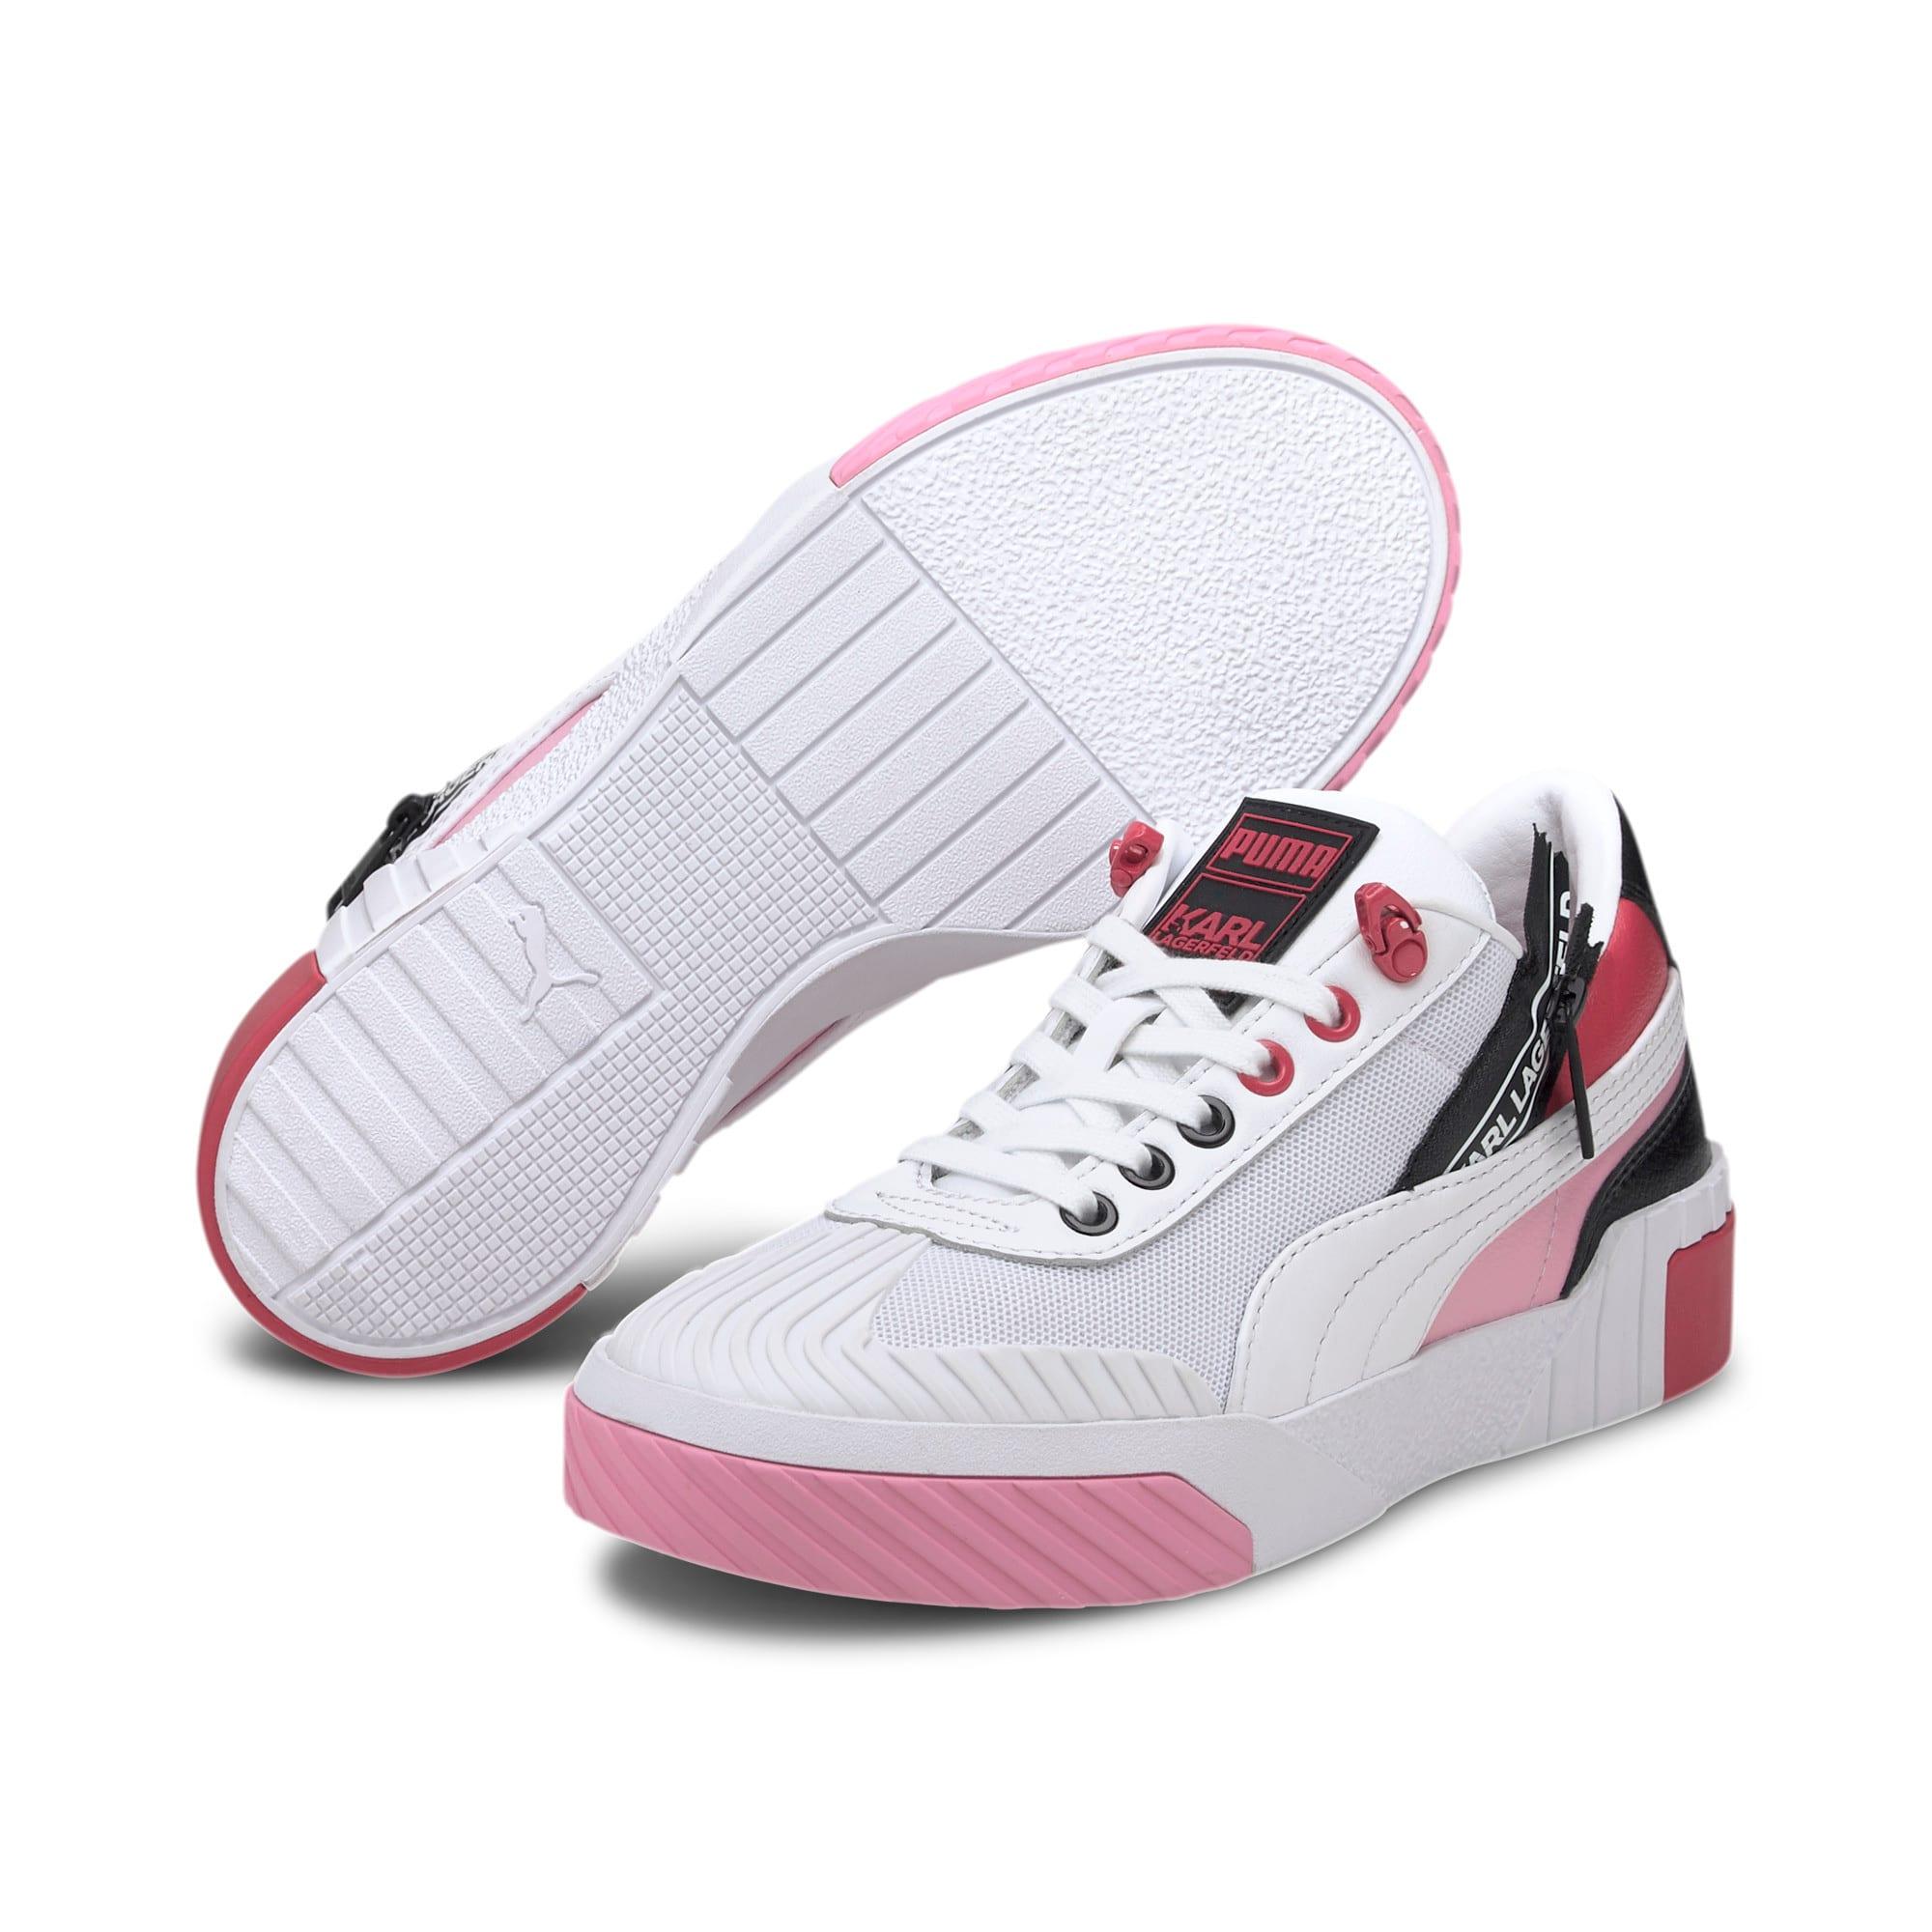 Thumbnail 3 of PUMA x KARL LAGERFELD Cali Women's Training Shoes, Puma White-PRISM PINK, medium